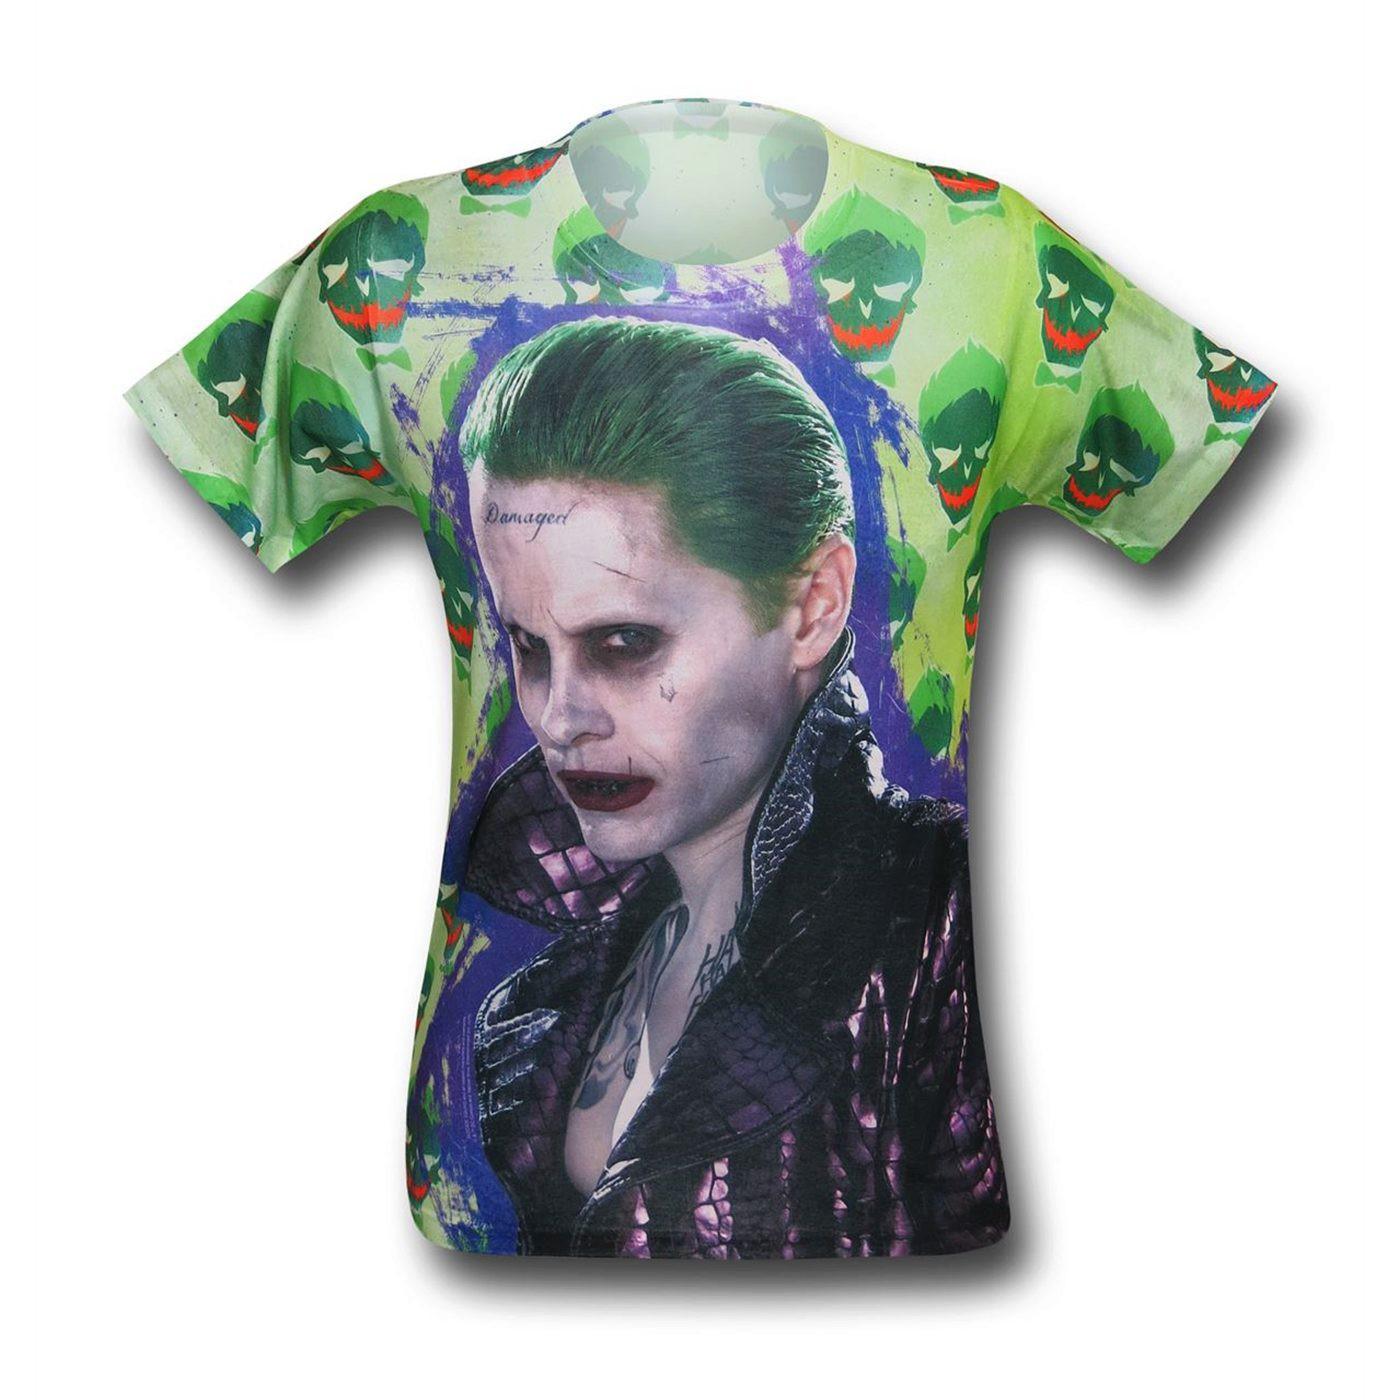 Suicide Squad Joker Jacket Sublimated Men's T-Shirt